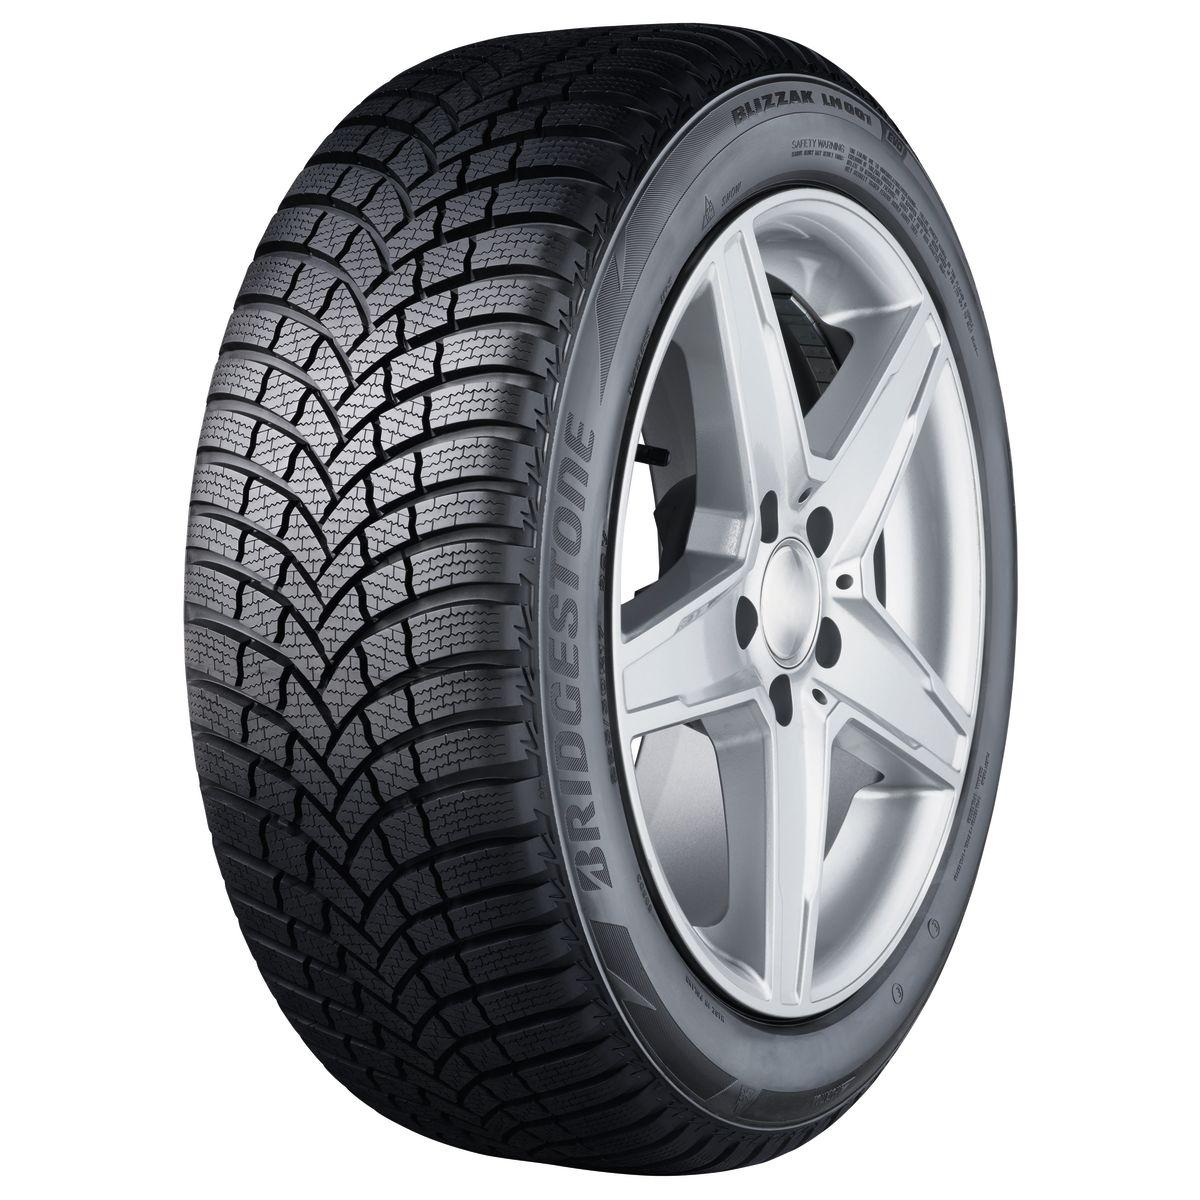 195/65R15 91T, Bridgestone, LM-001 Evo